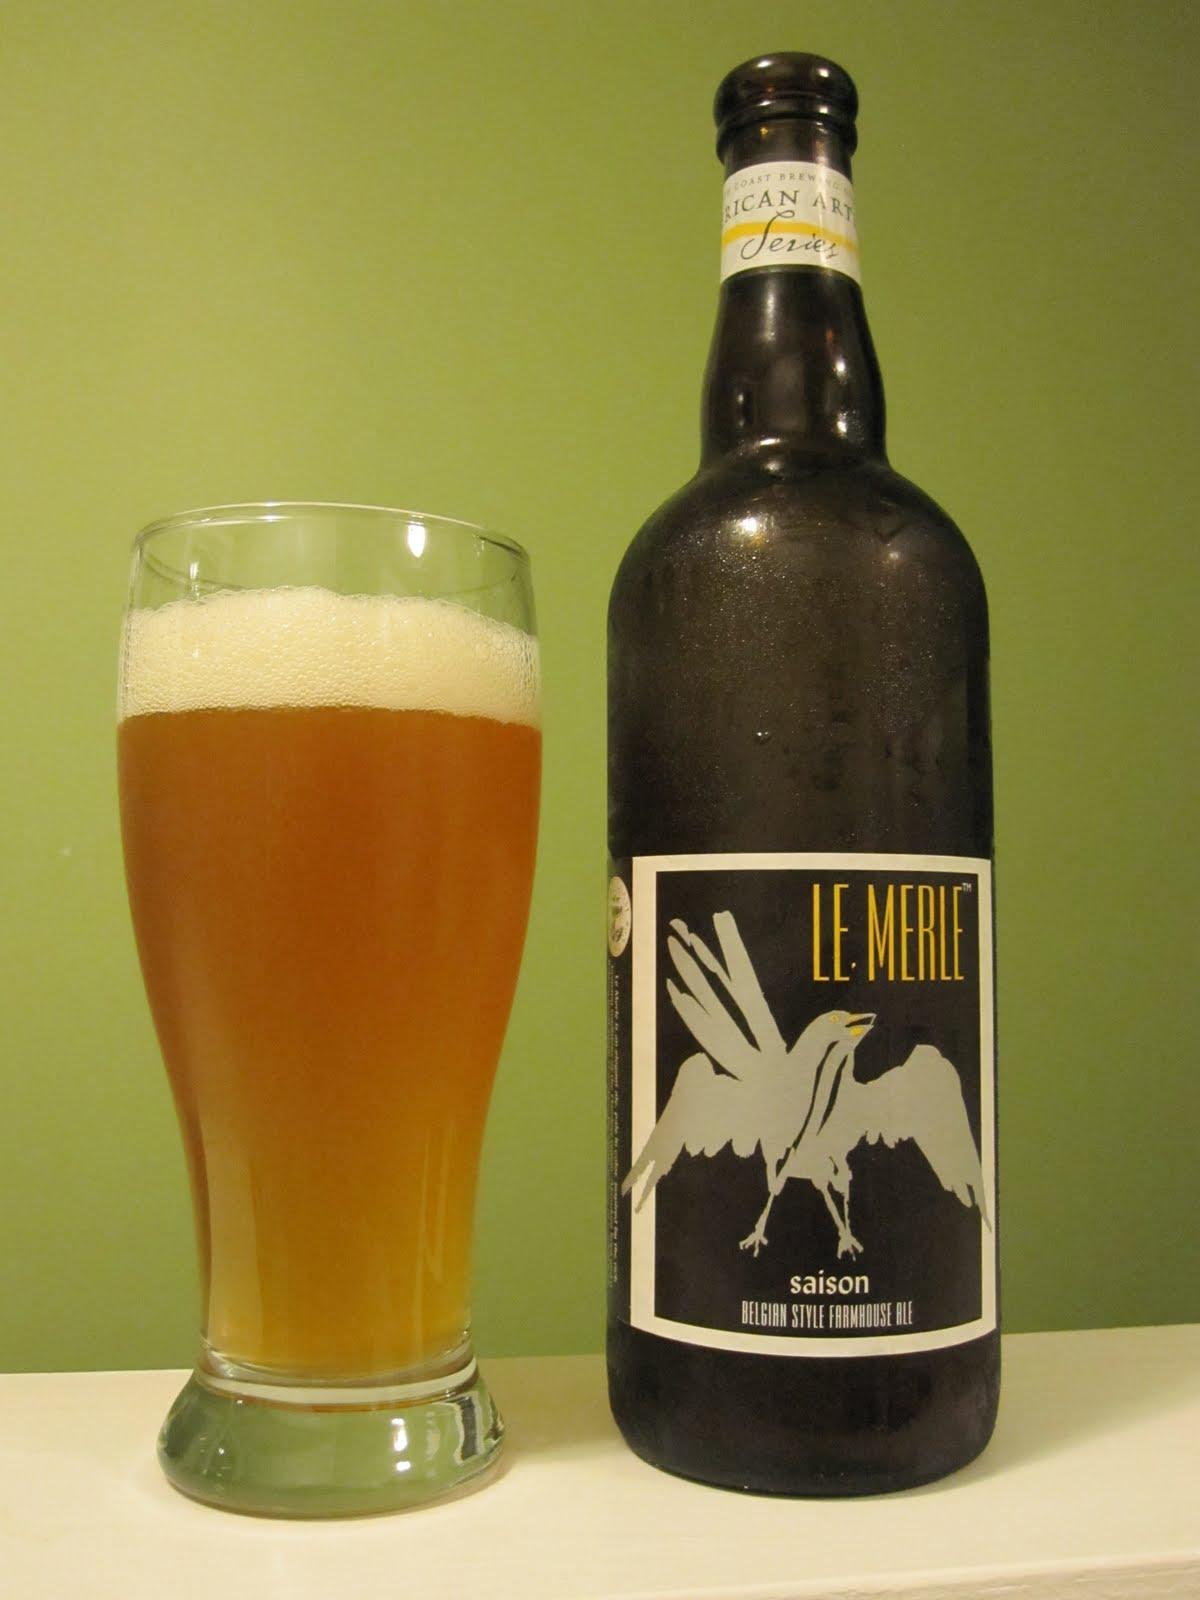 PEI Beer Guy Le Merle Saison Farmhouse Ale